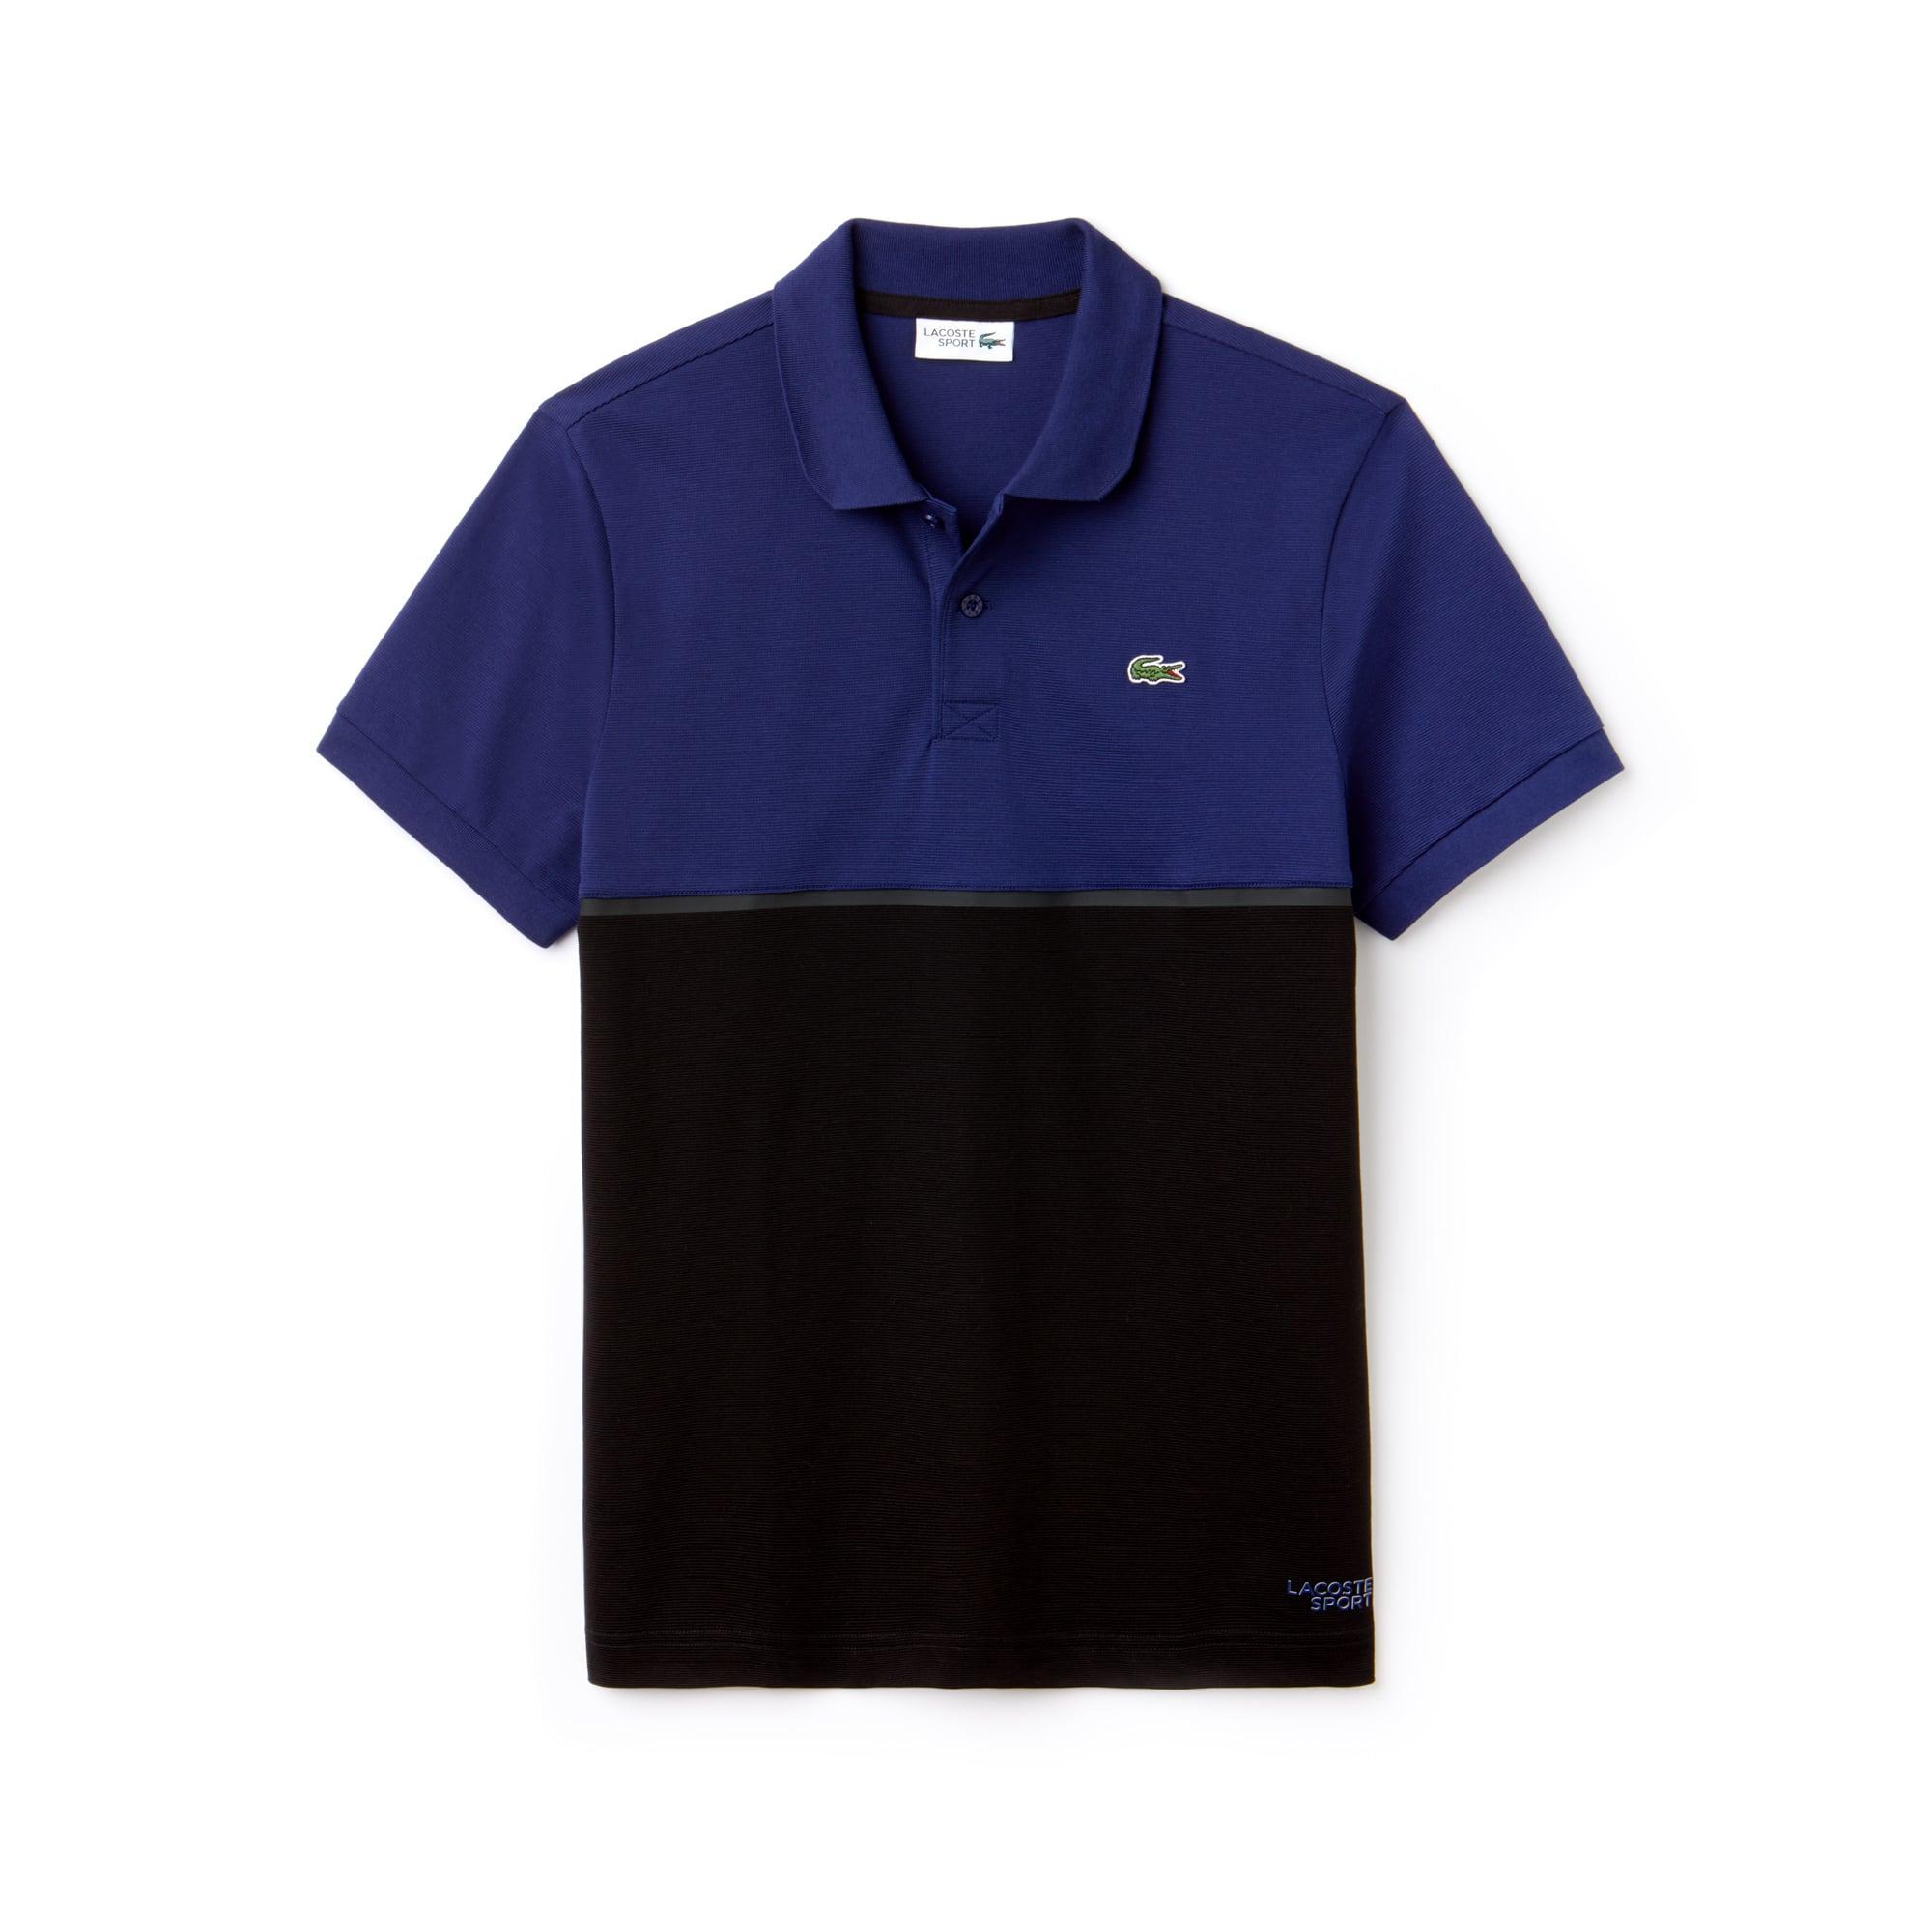 Lacoste SPORT Tennis-polo heren colorblock ultralicht katoen